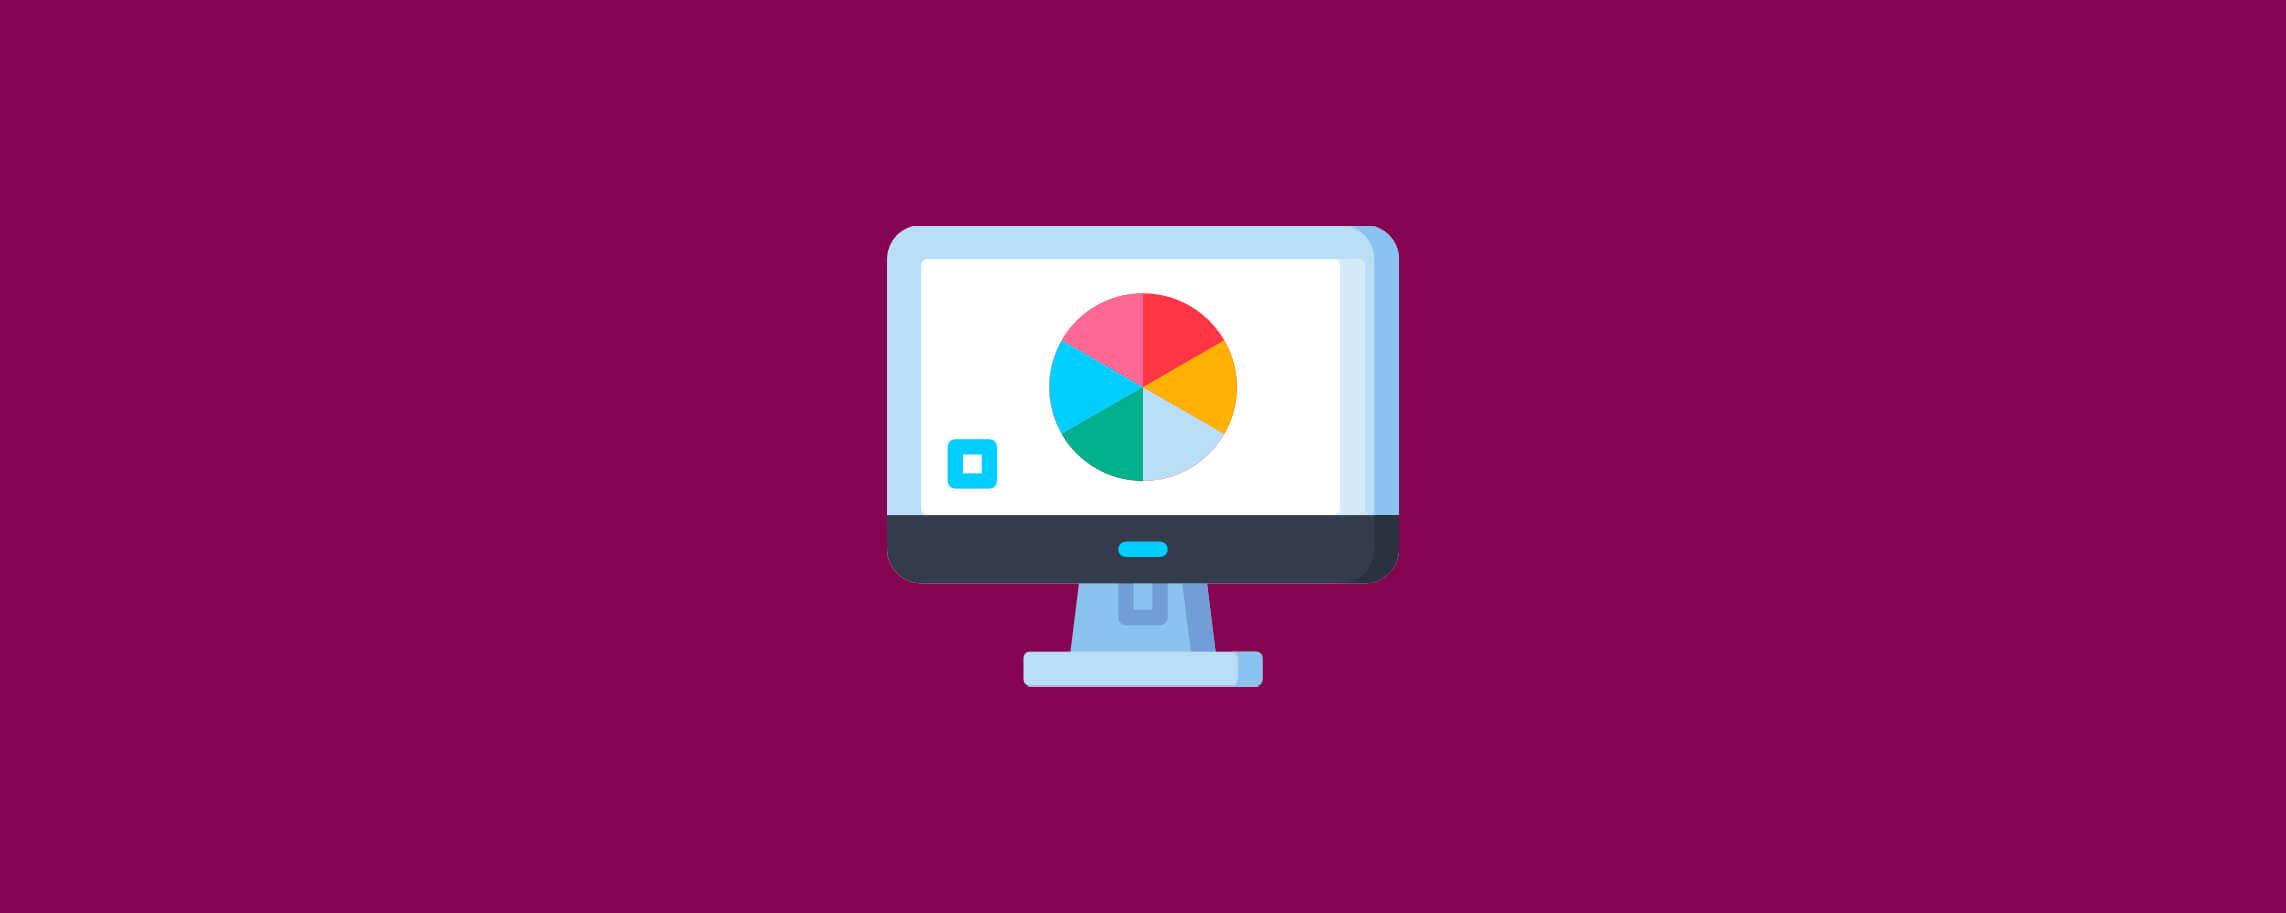 mejor calibrador de monitor para diseño grafico